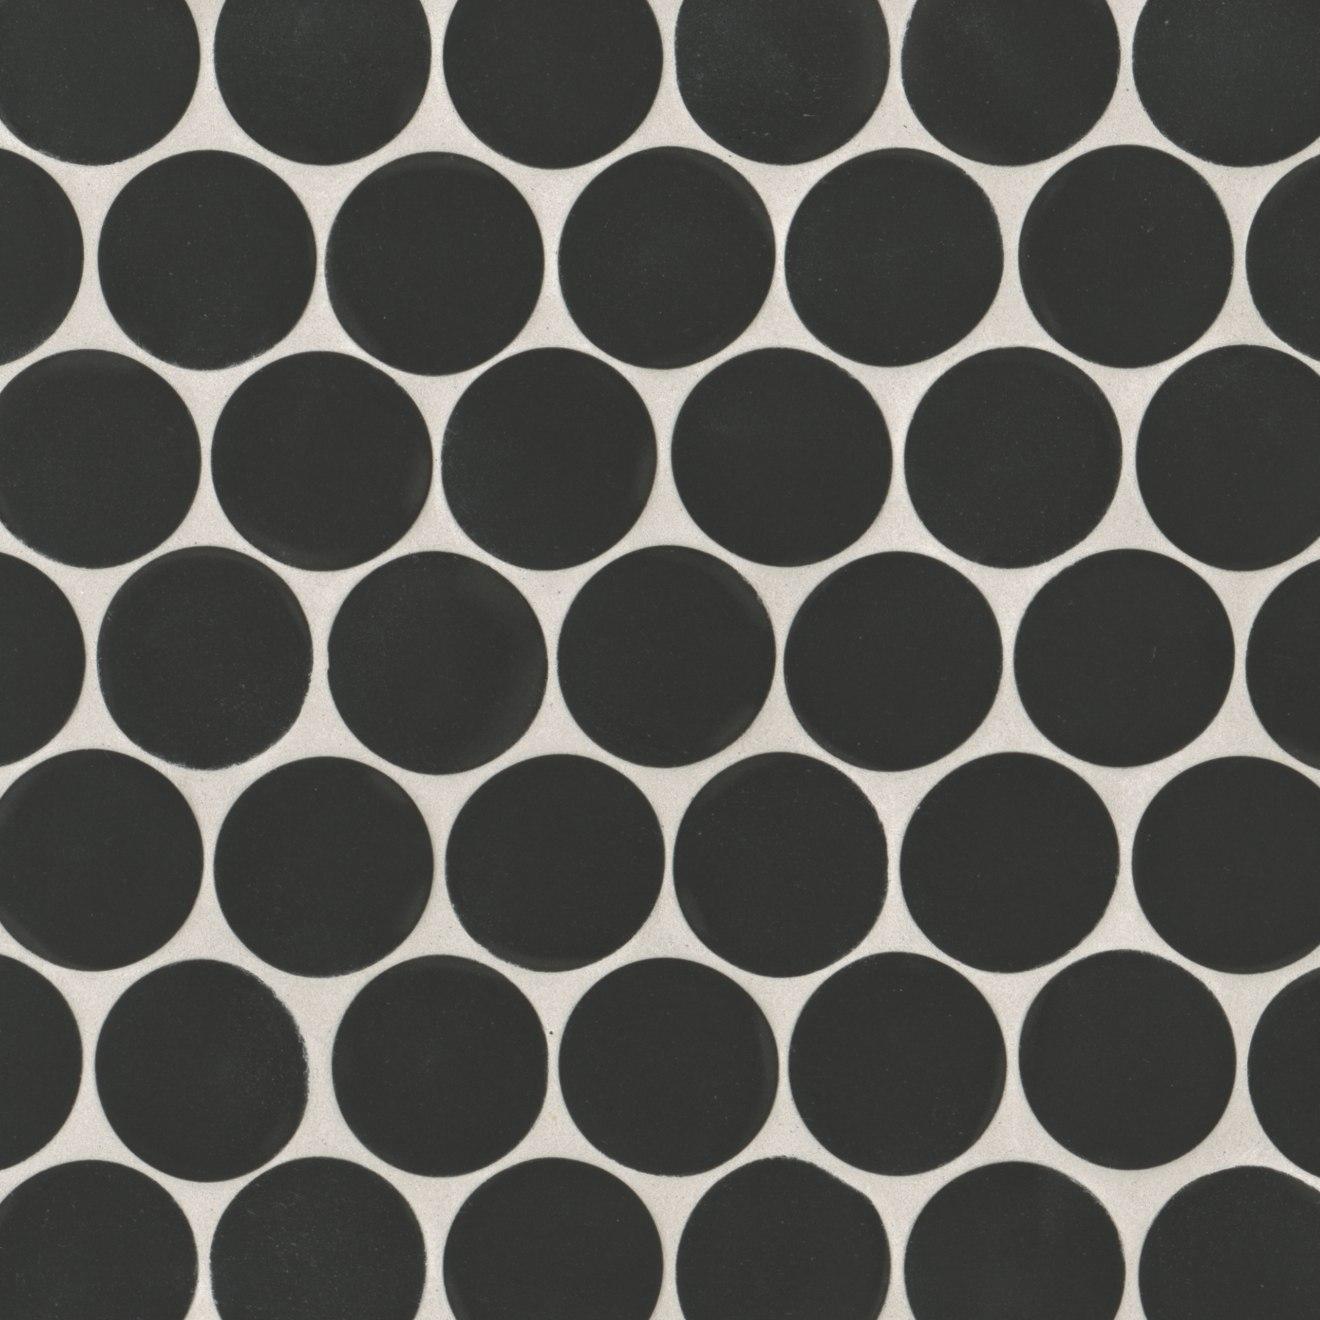 "Makoto 2"" Round Matte Porcelain Floor and Wall Mosaic in Kuroi Black"